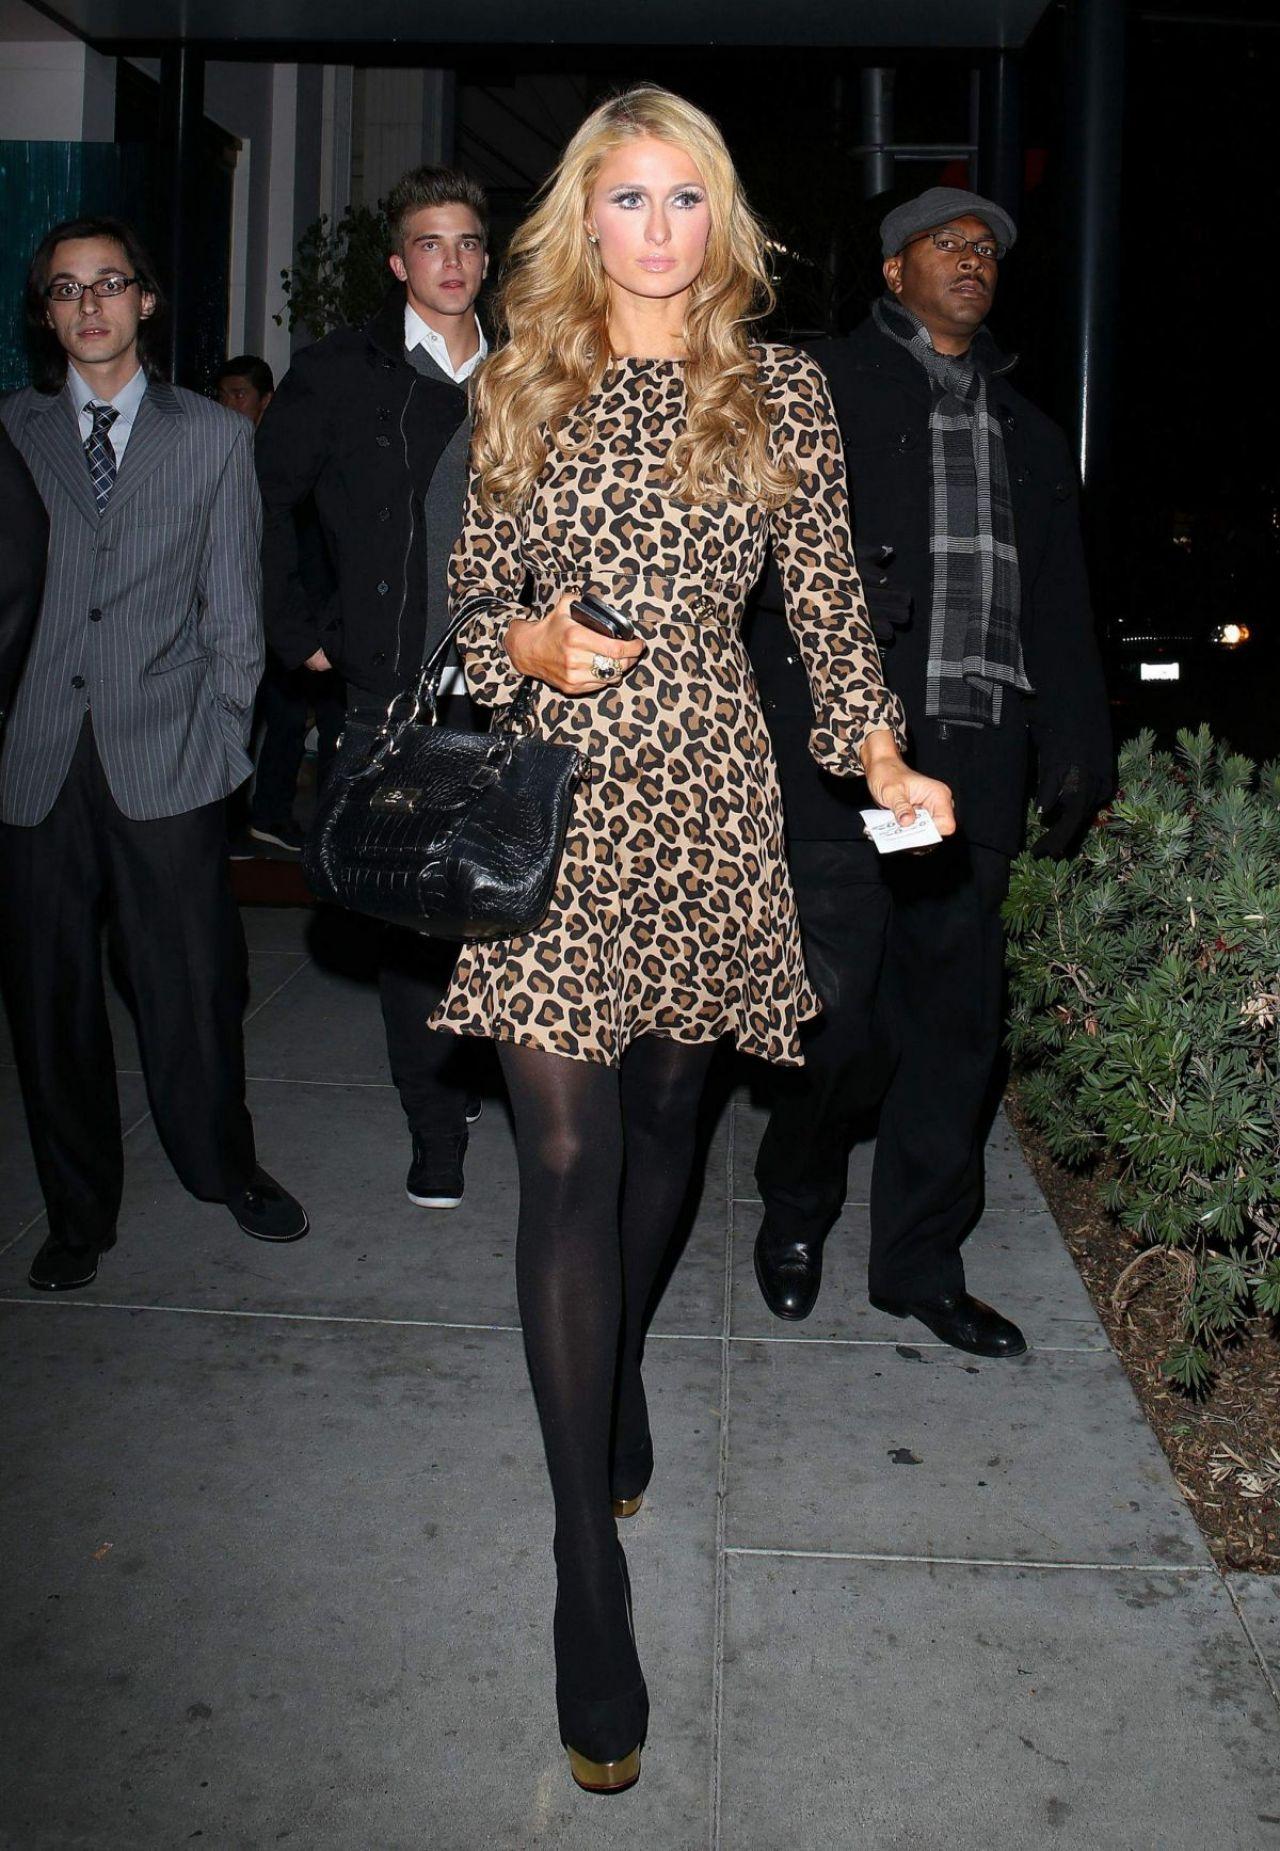 Paris Hilton At Mastros Restaurant In Beverly Hills - December 2013